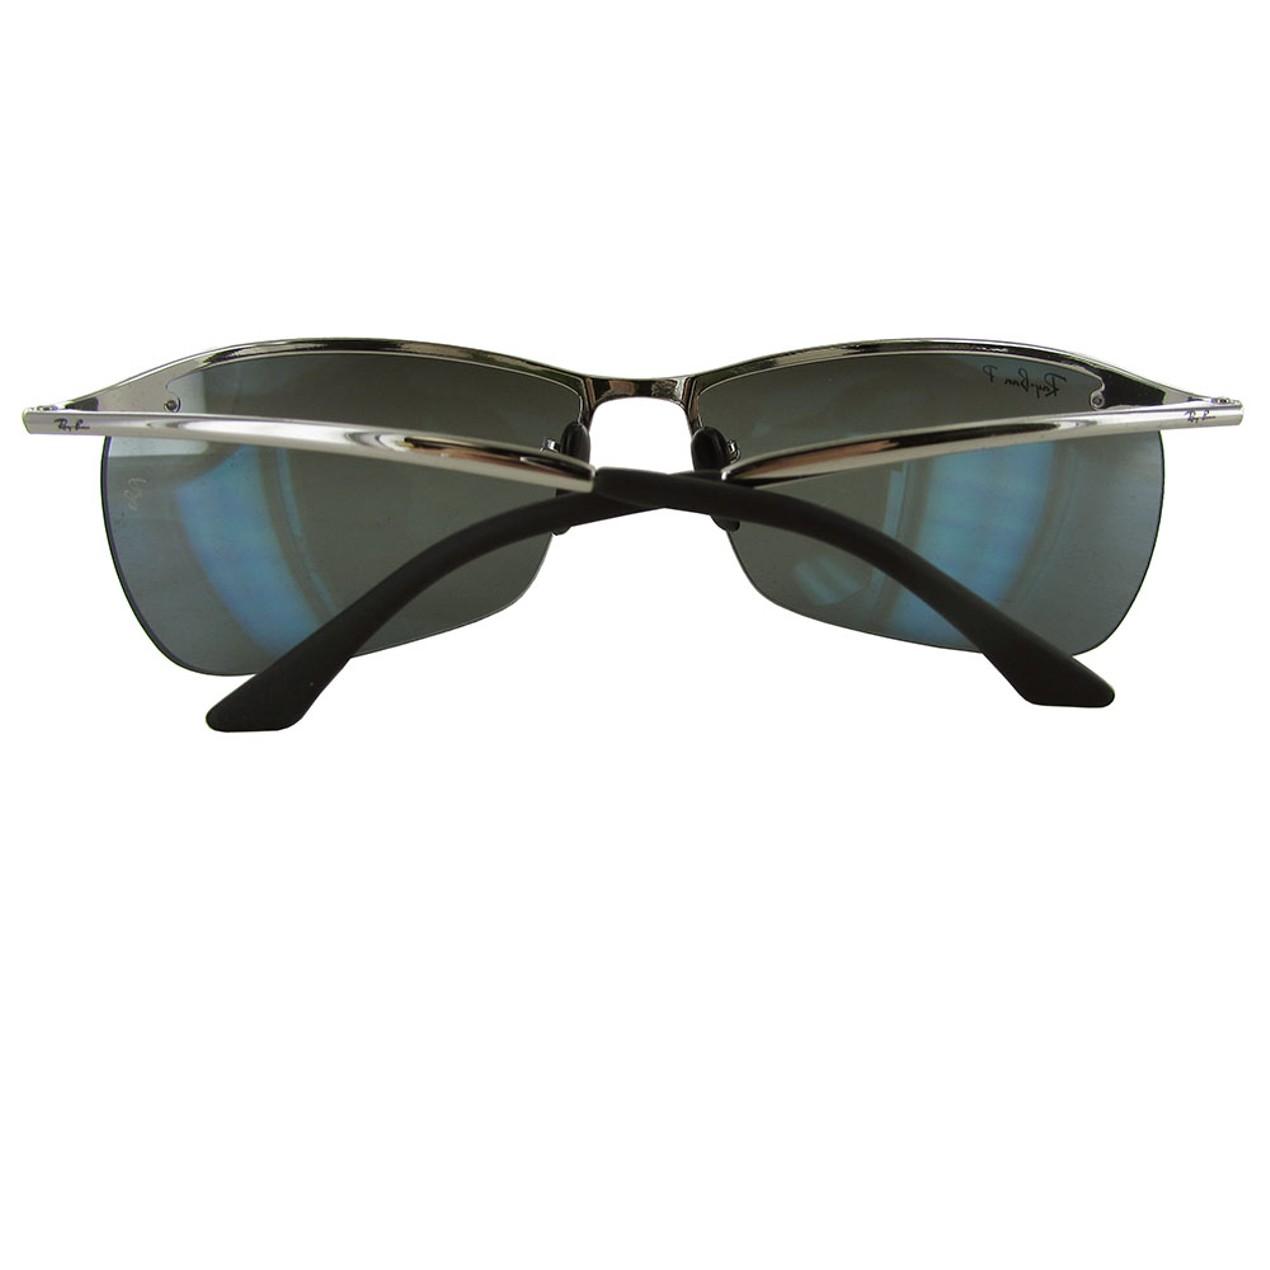 d1ff157bd5 Ray Ban Mens RB3544 Chromance Polarized Sunglasses - Tanga